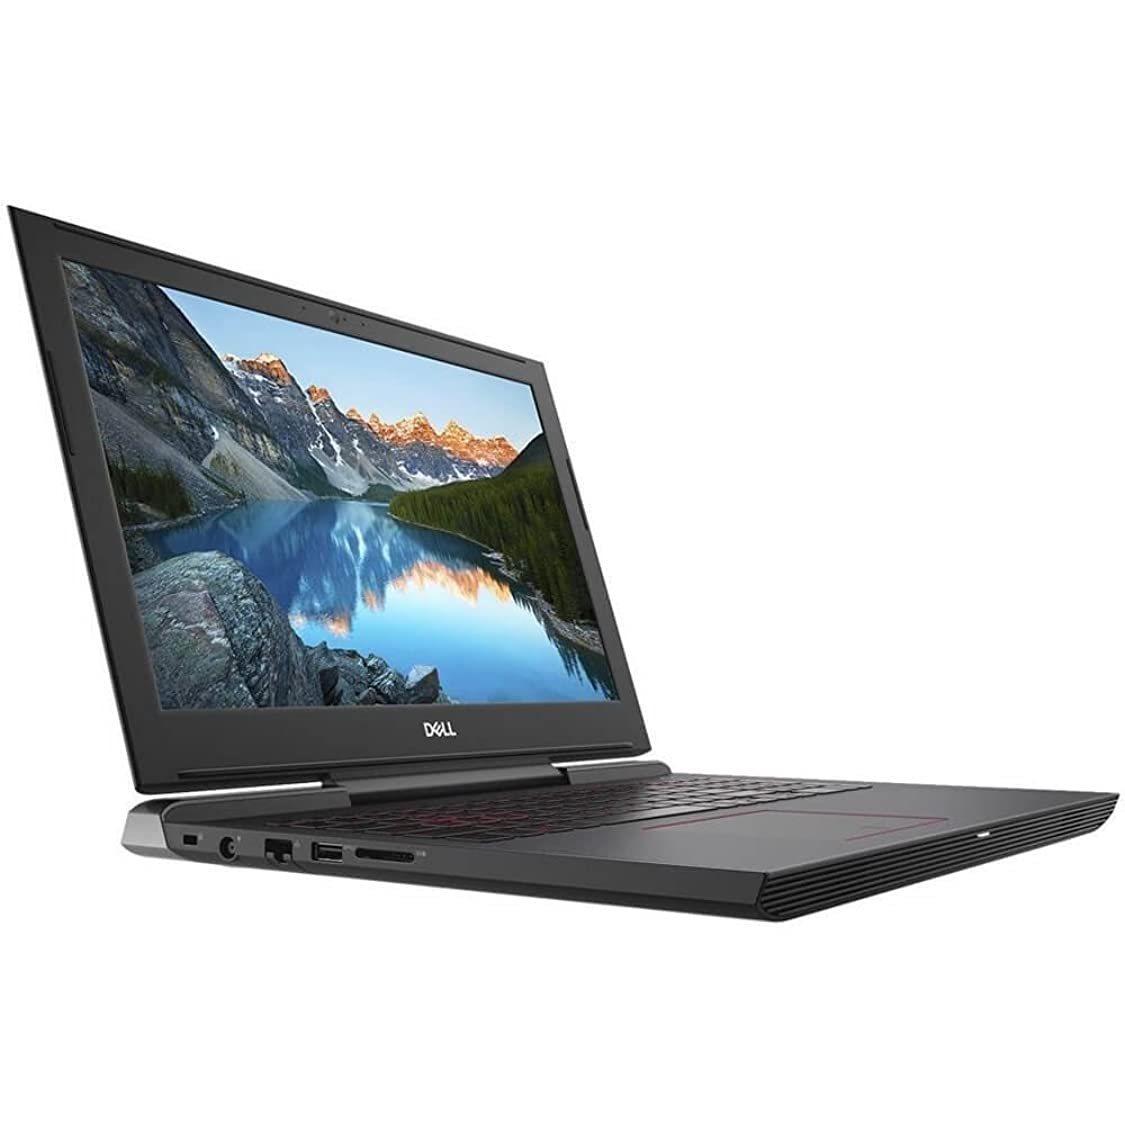 Dell Inspiron 15 7577 Laptop: Core i5-7300HQ, 256GB SSD, NVidia GTX 1060 6GB, 8GB RAM, 15.6inch Full HD Display (Renewed) av98618115220873